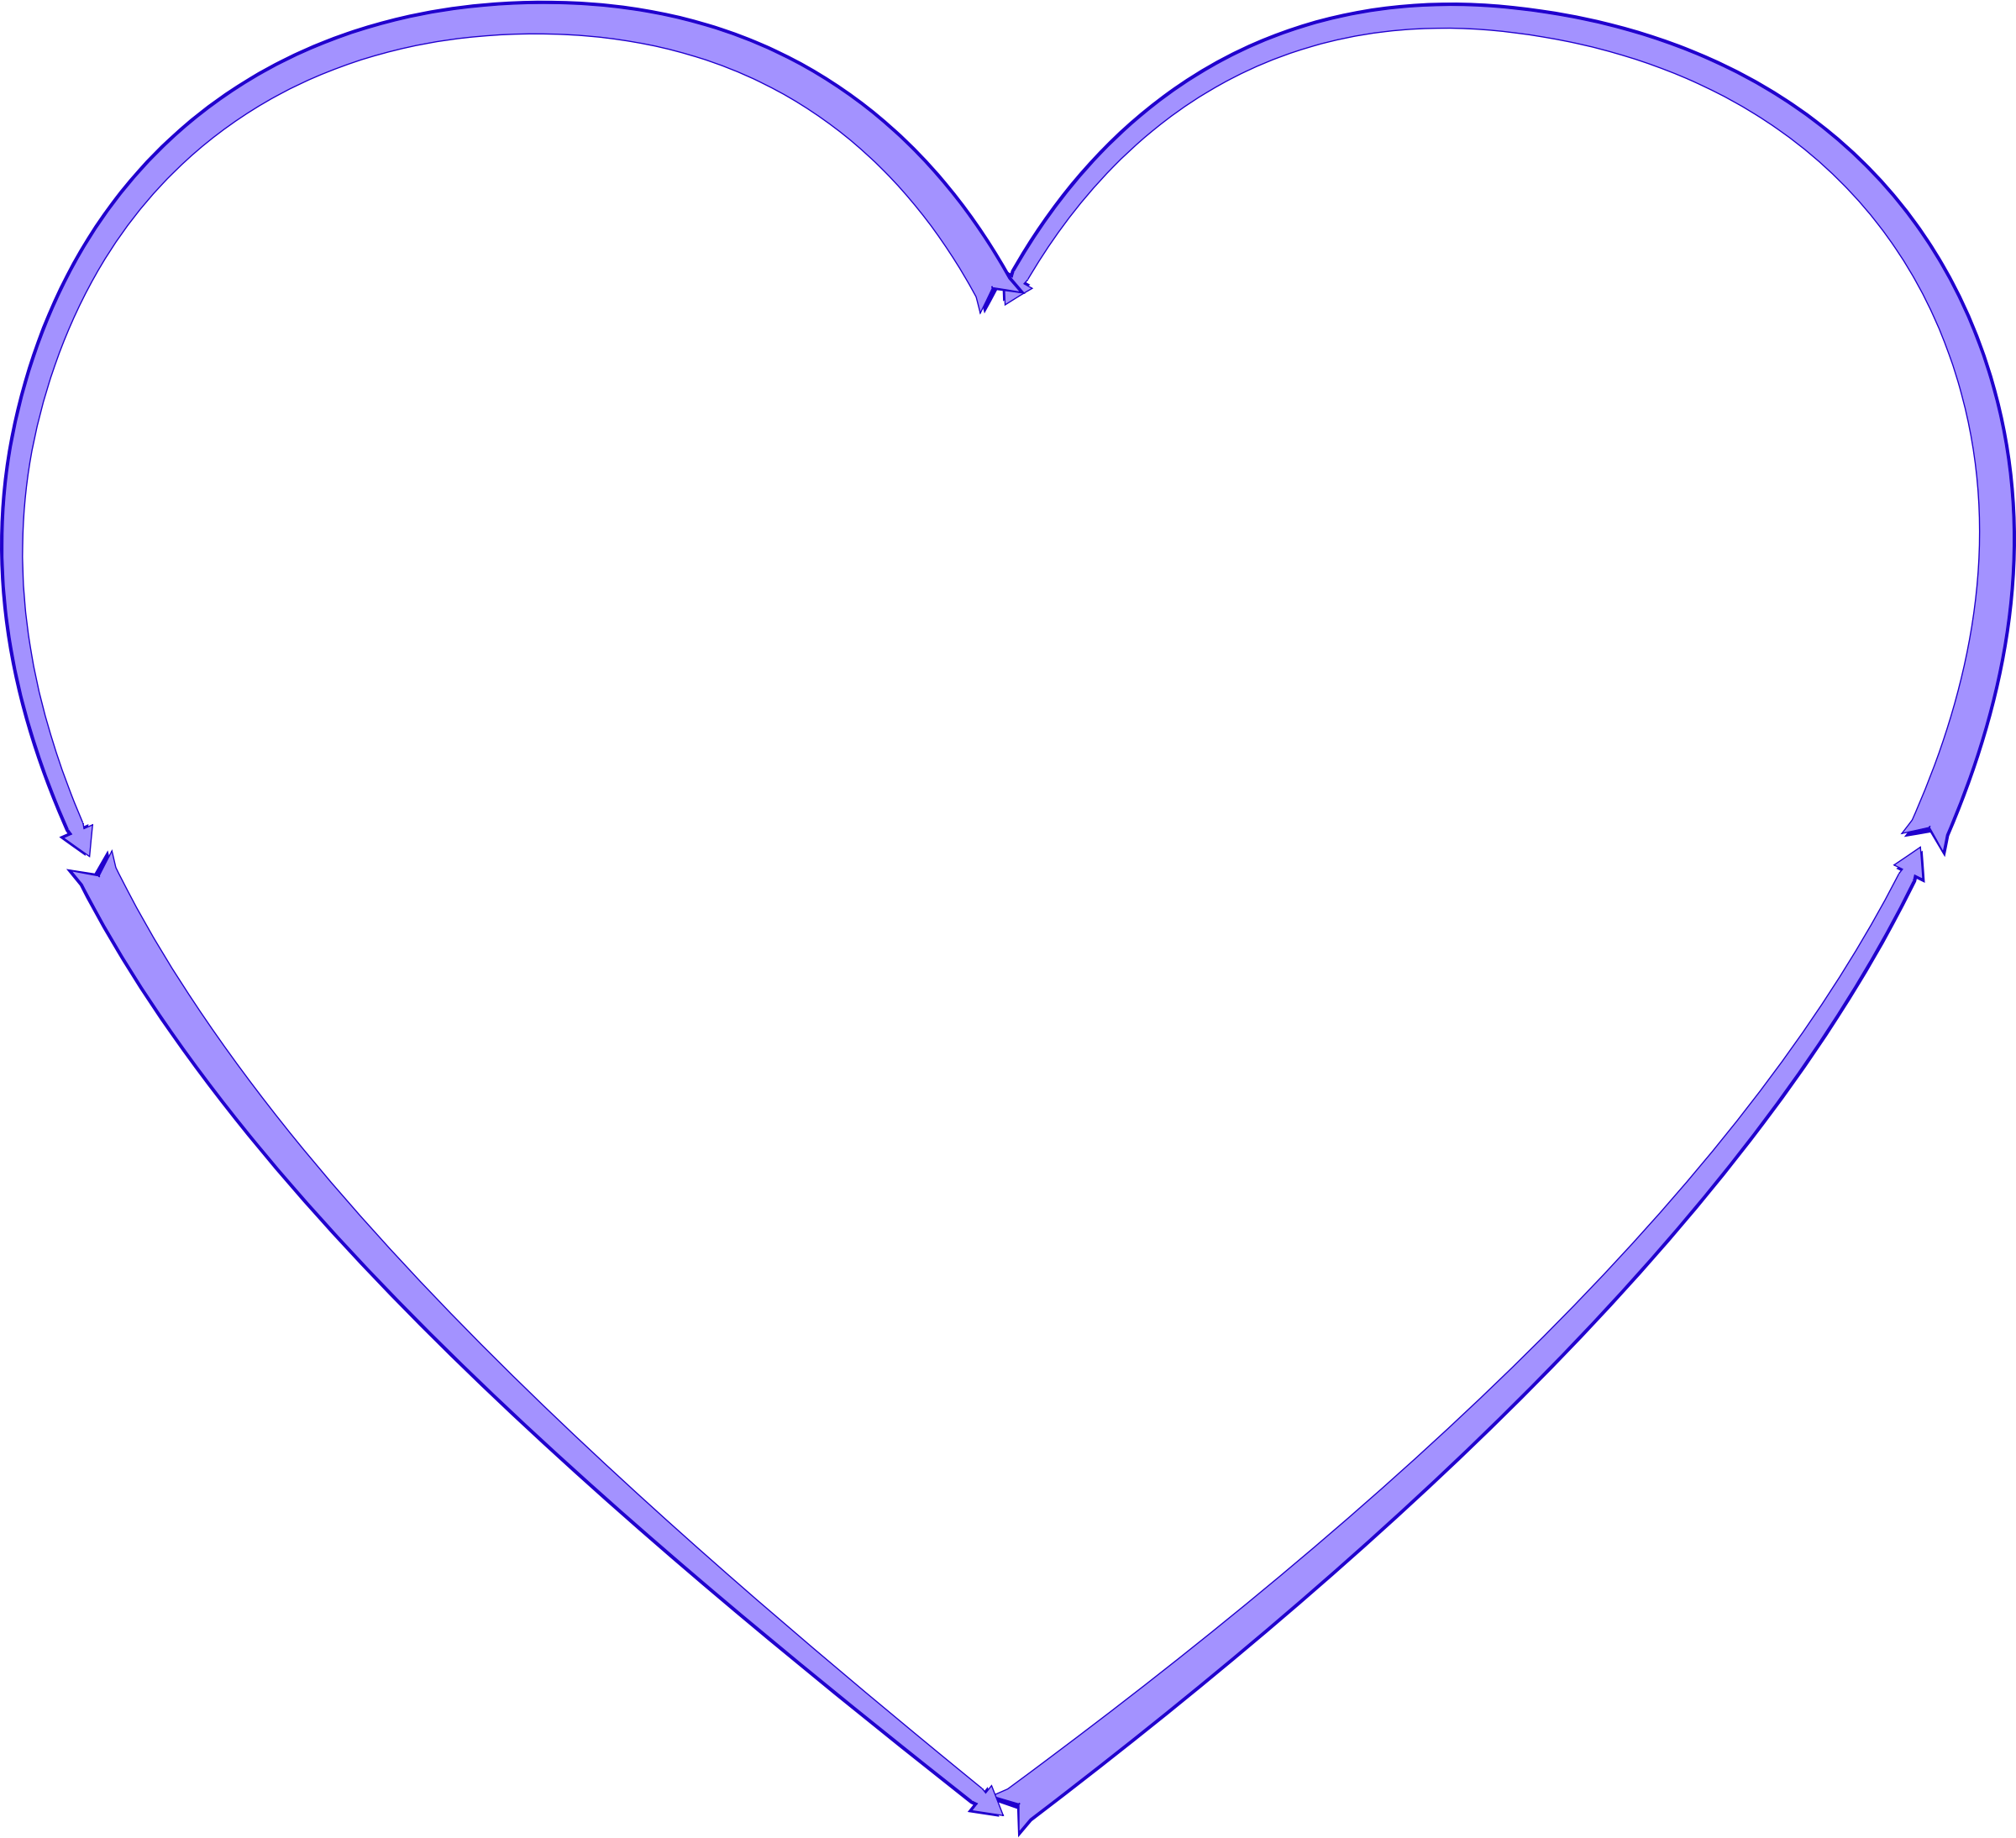 Heart arrow clipart banner download Clipart - Arrow Heart 3 banner download